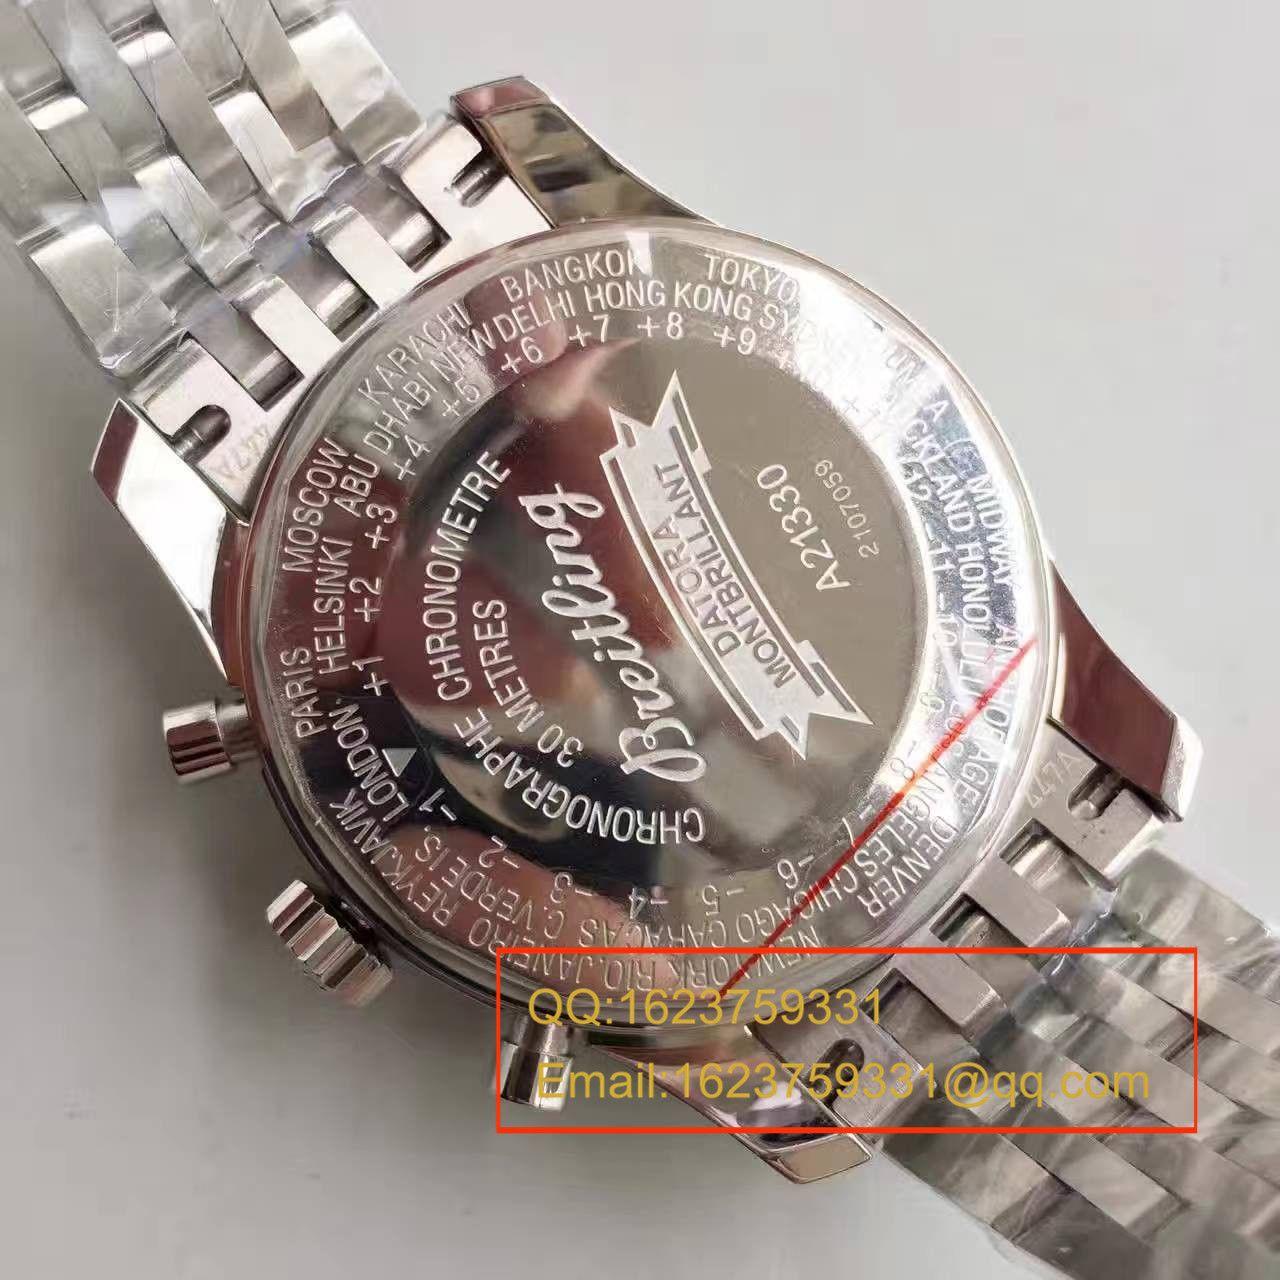 【JF一比一高仿手表】百年灵蒙柏朗计时系列A2133012-B571棕盘腕表 / BL035